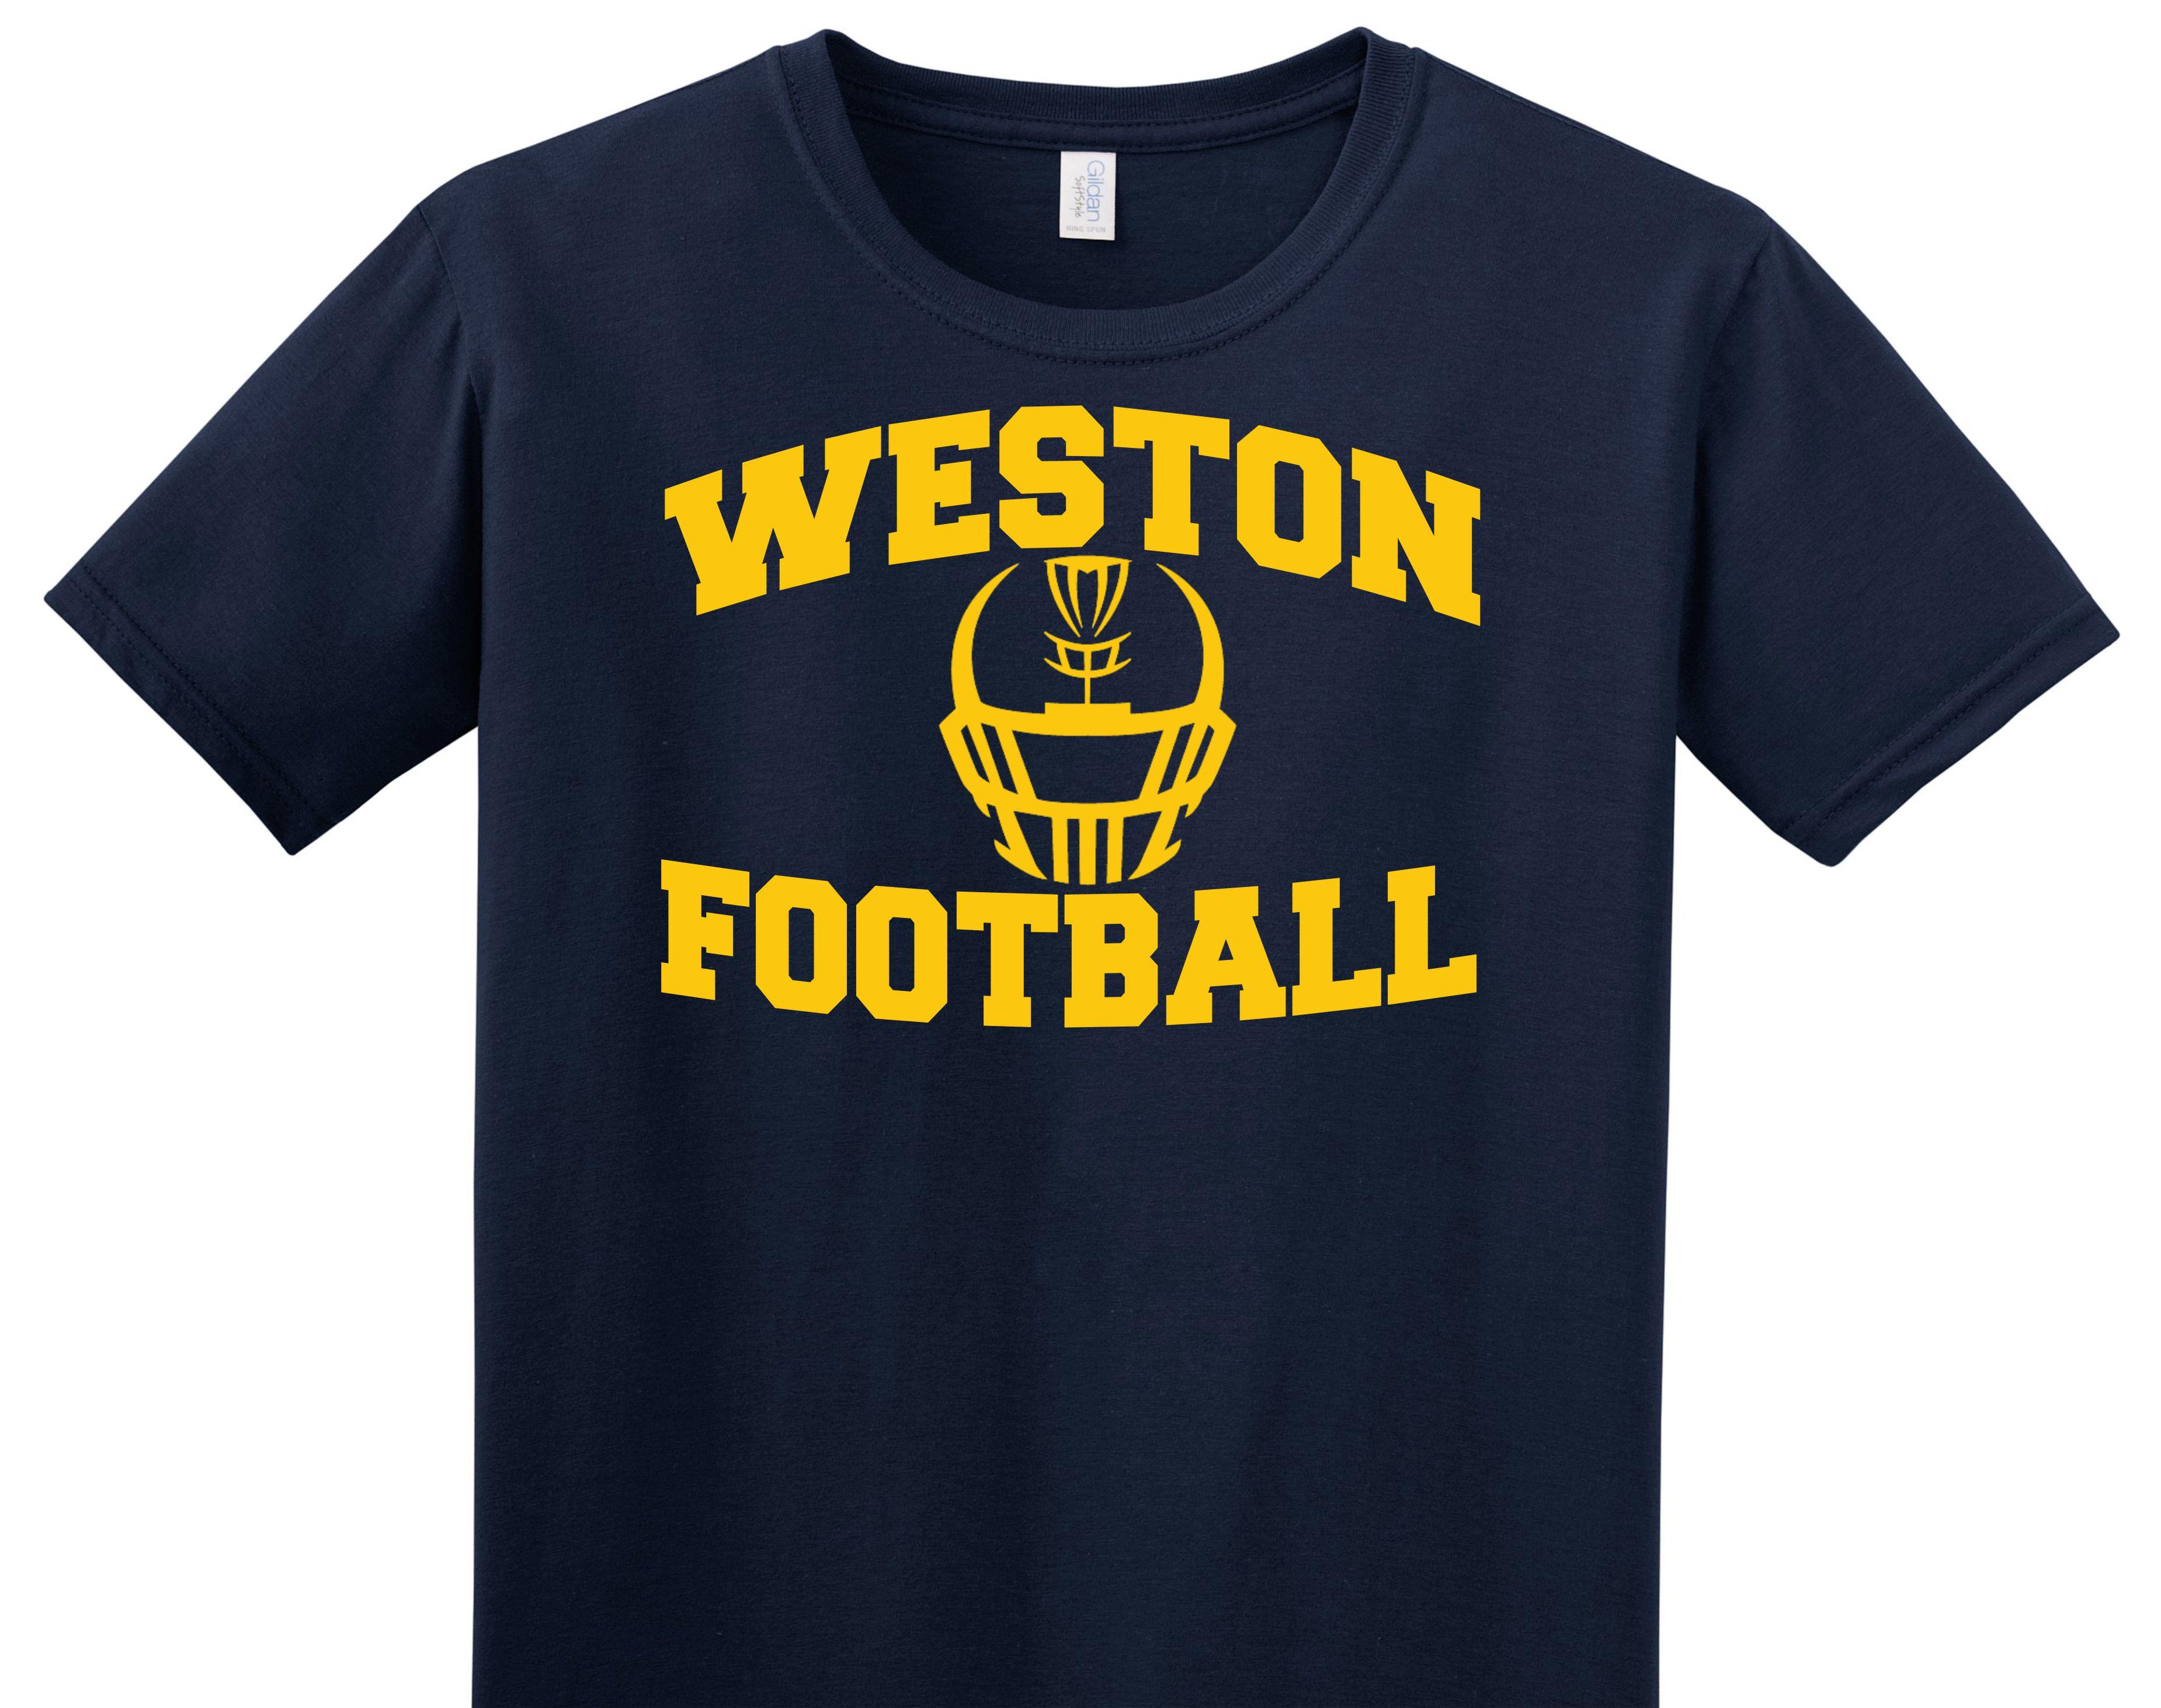 Varsity imprints weston hs football helmet t shirt for High school shirts designs